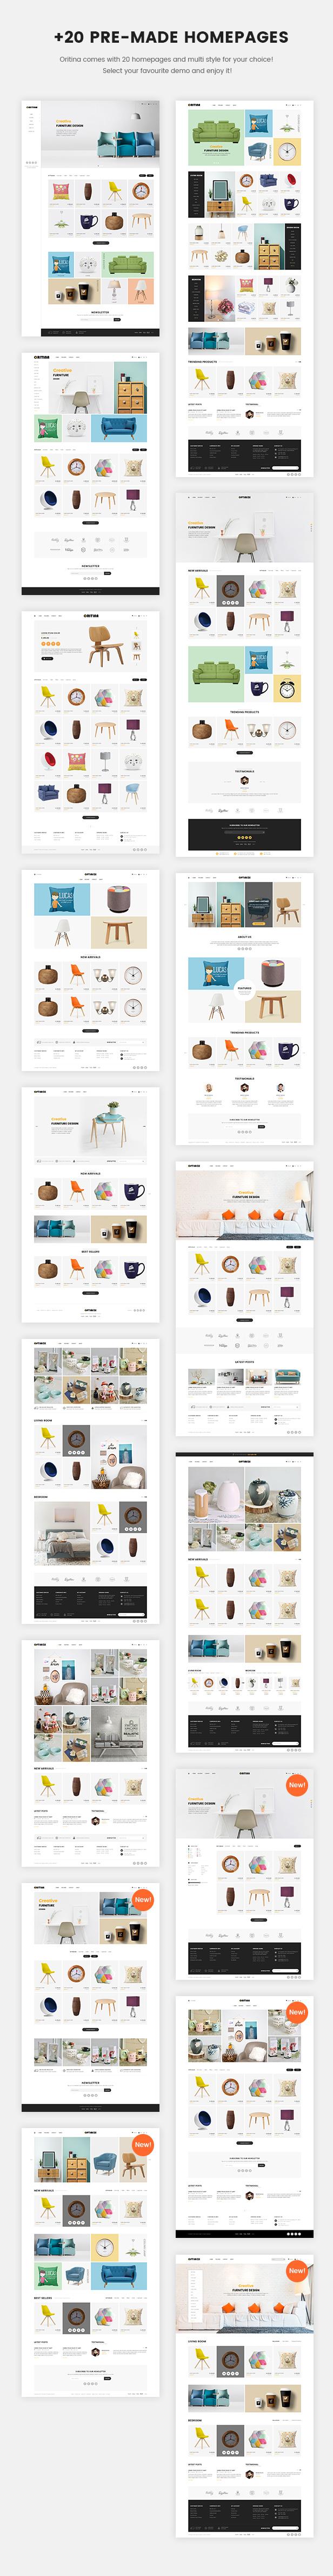 Oritina - Minimal WooCommerce Theme For Furniture, Decor, Interior - 1